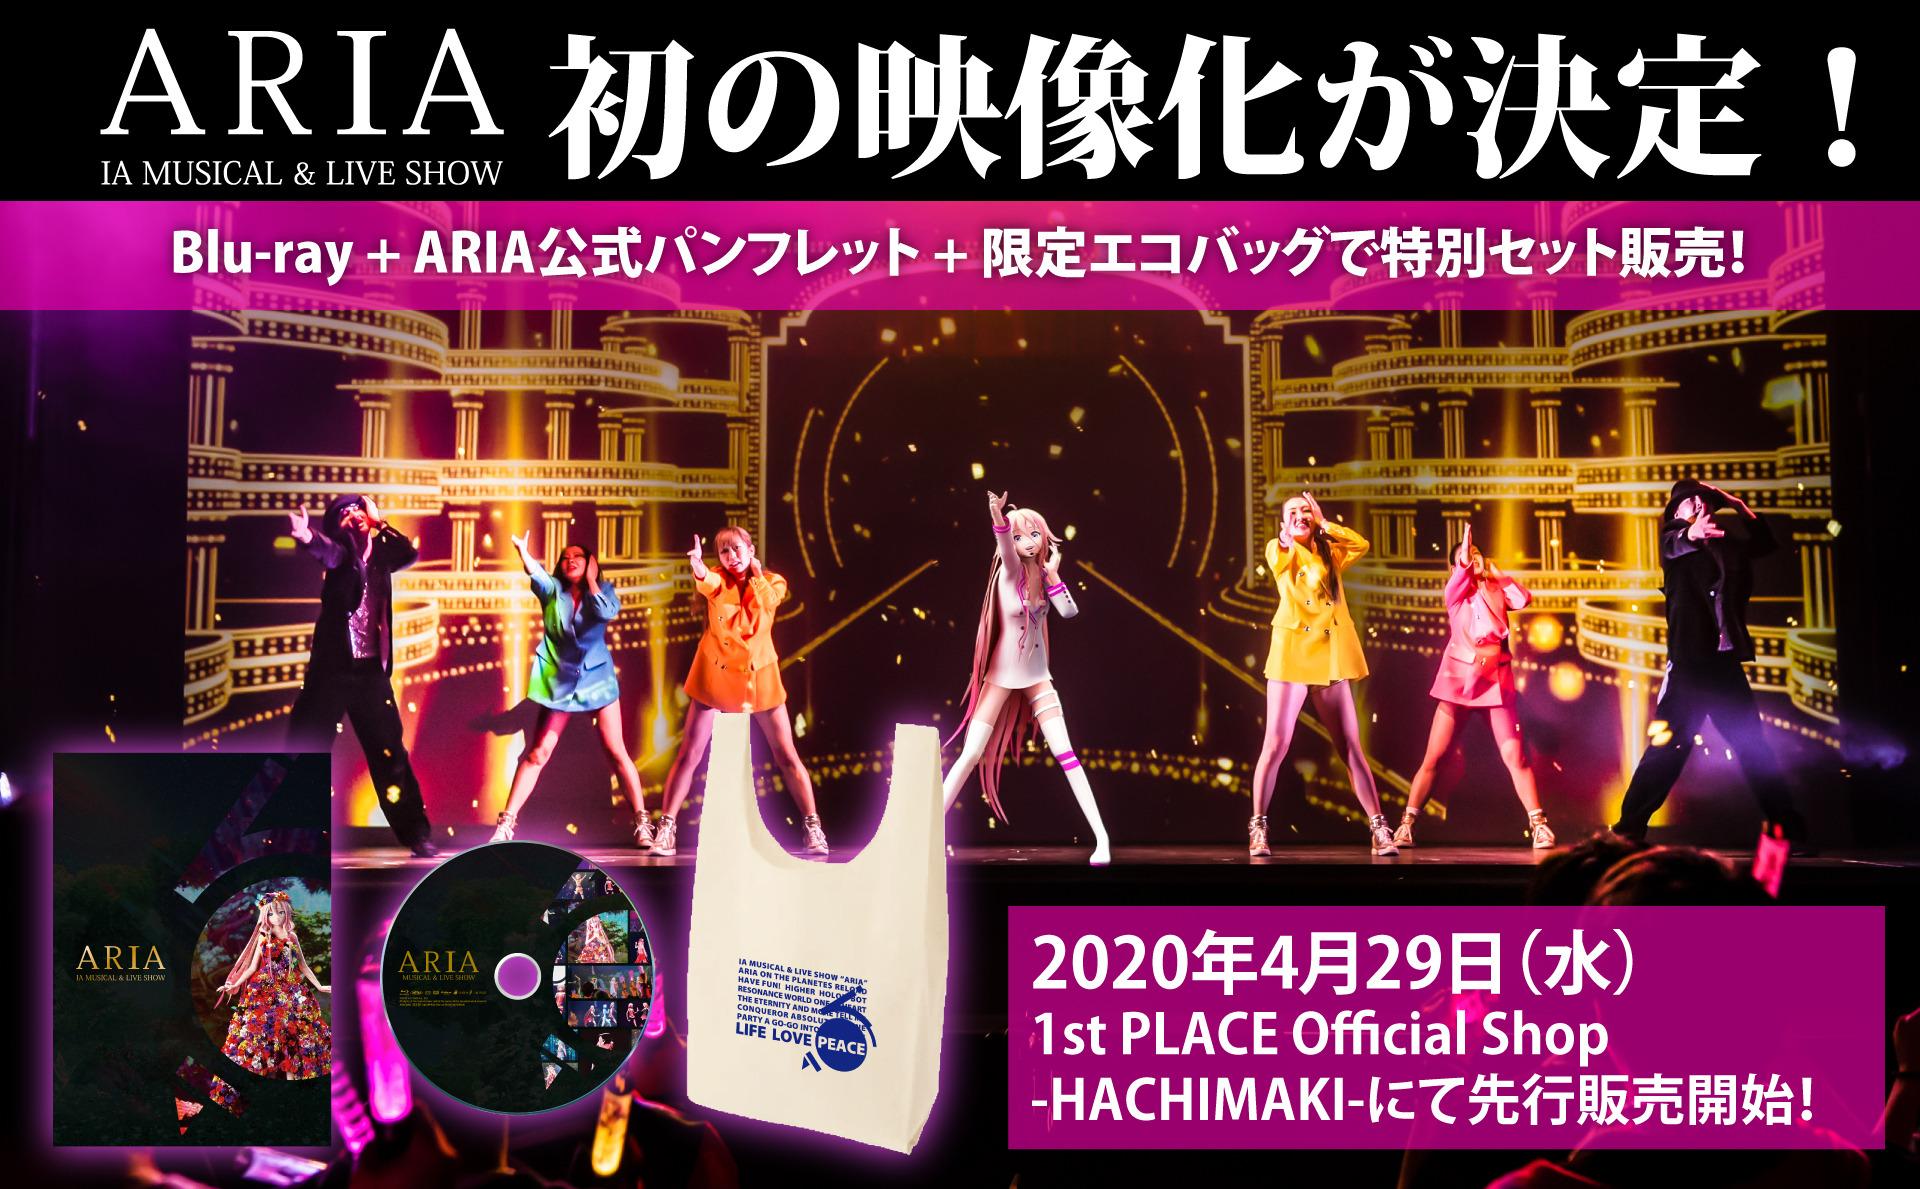 ARIA –IA MUSICAL & LIVE SHOW–のトレーラー映像が公開! 4月29日にBlu-ray発売!